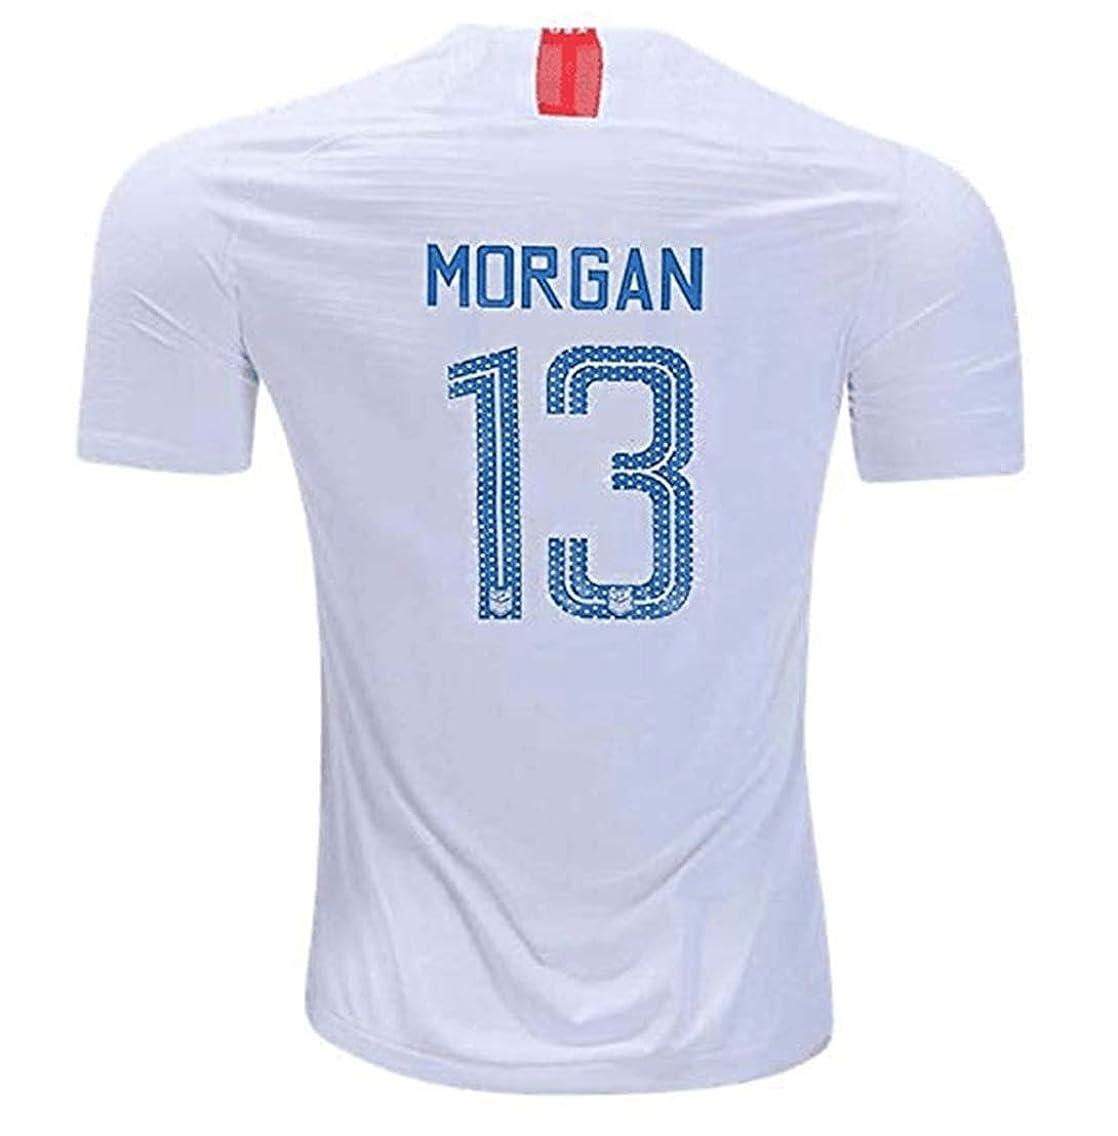 LISIMKE Soccer Team 2018/19 USA National Home Morgan Womens Replica Jersey:Jersey&Shorts Kid Youth Replica Jersey Kit